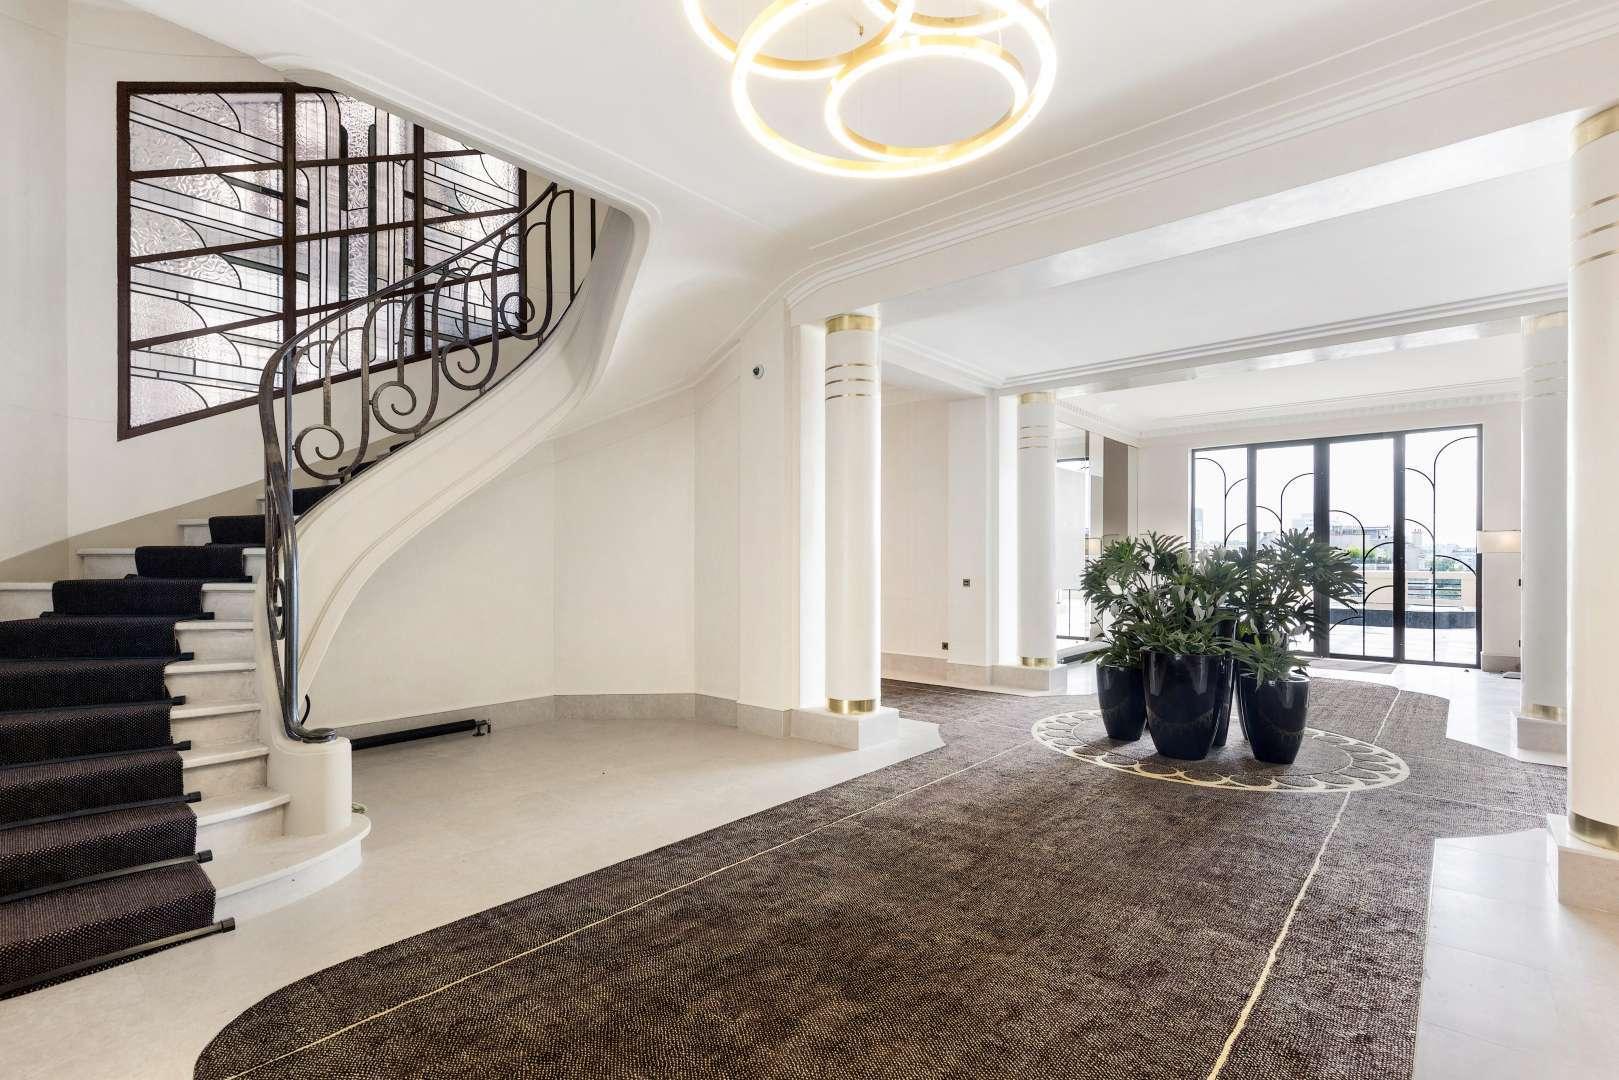 luxury real estate, Art Deco style, Raynouard